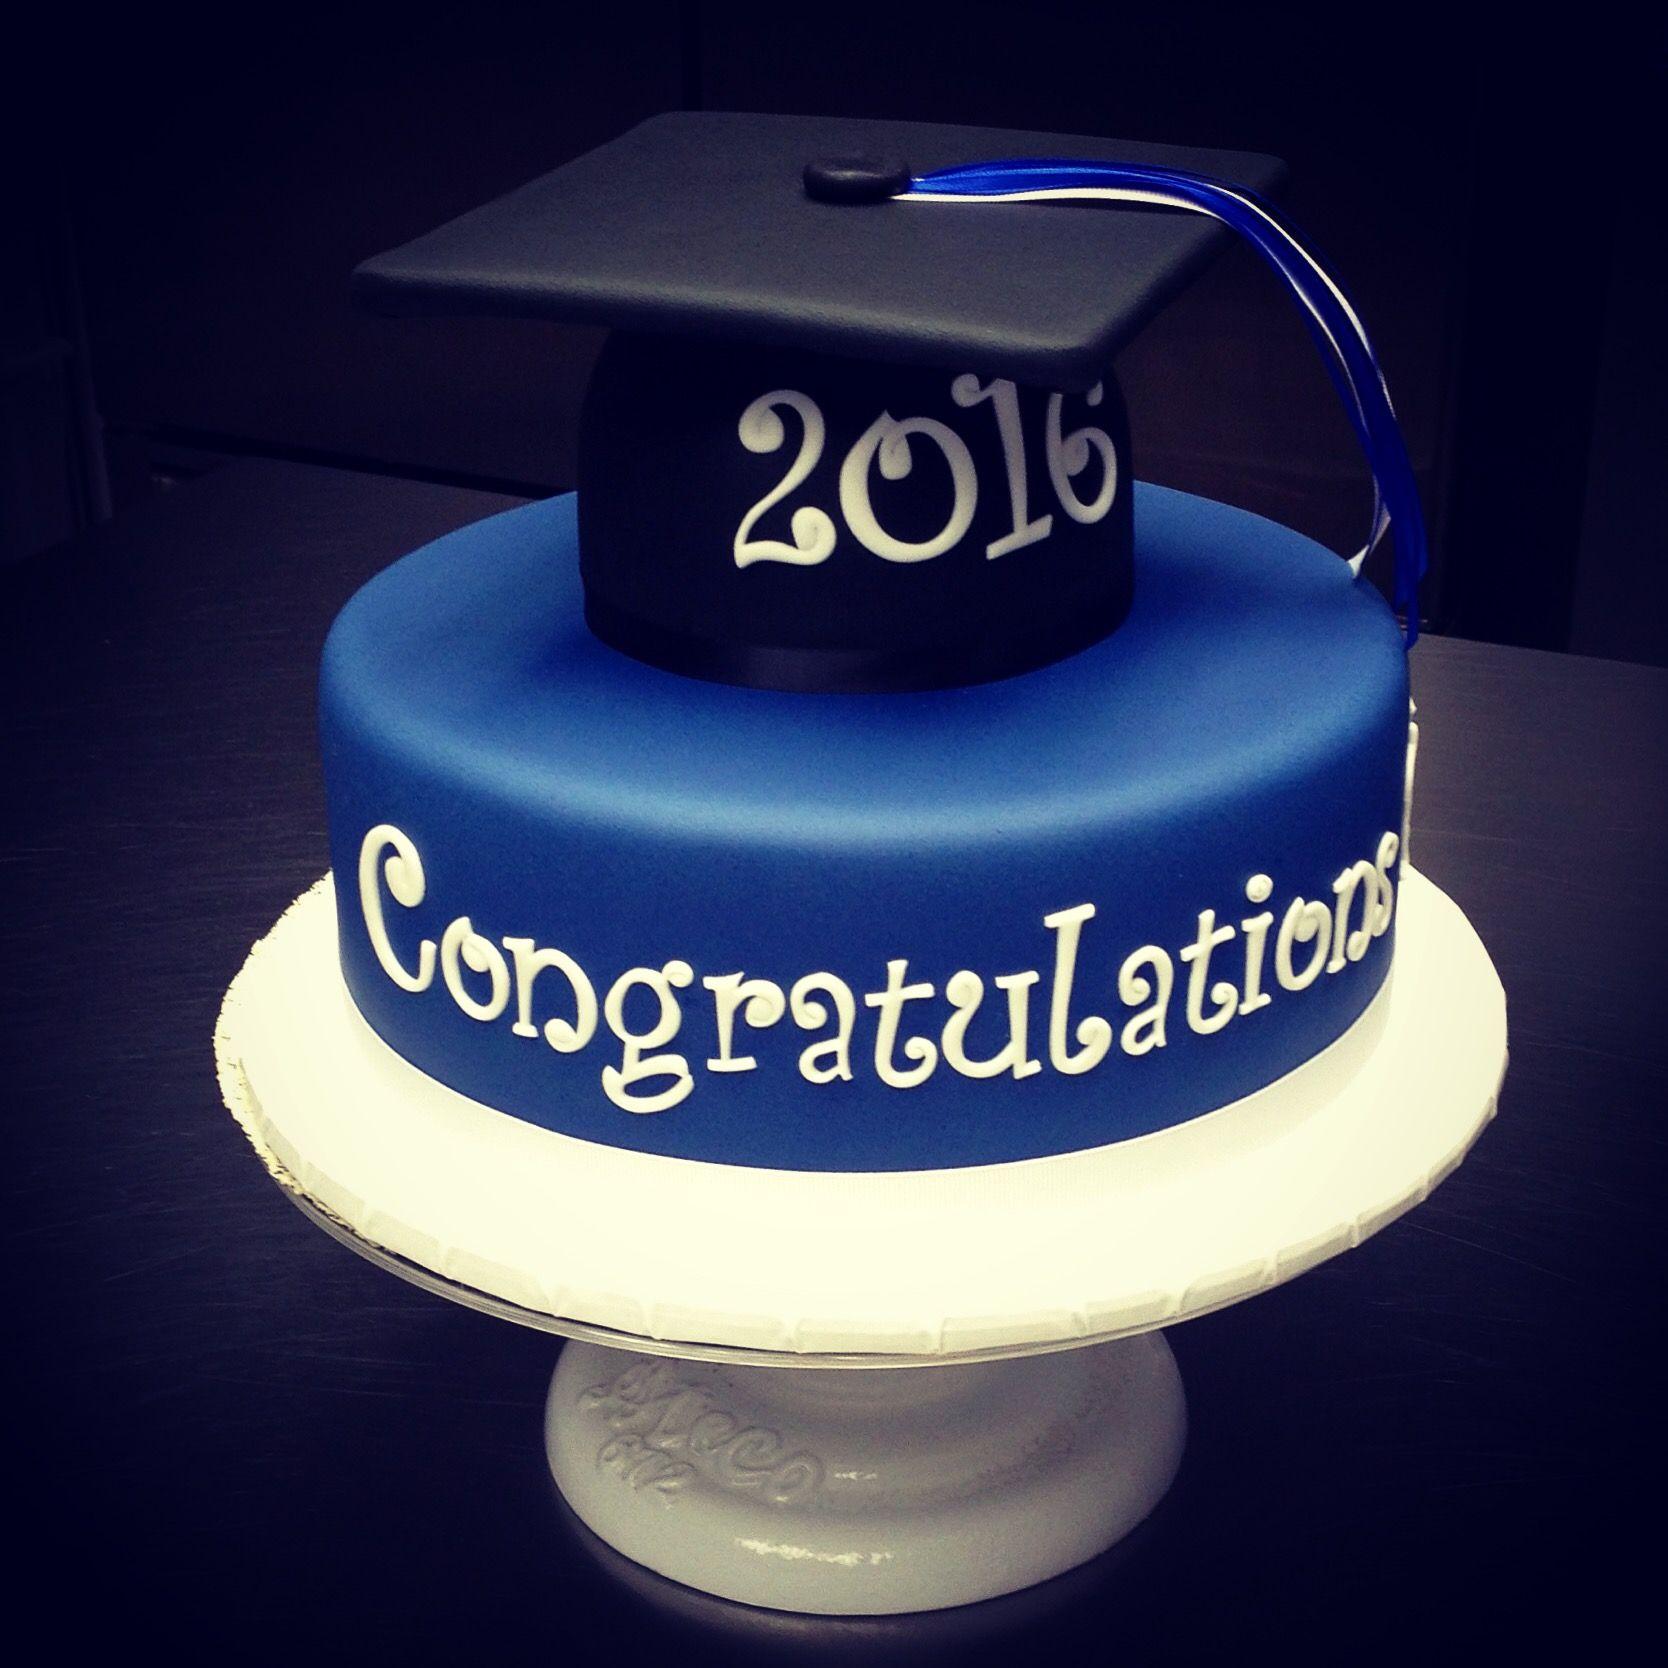 The Yale Blue Graduation Cake Sweet Mary S New Haven Ct 203 777 Mary 6279 Graduation Cakes Grad Cake Mary Cake